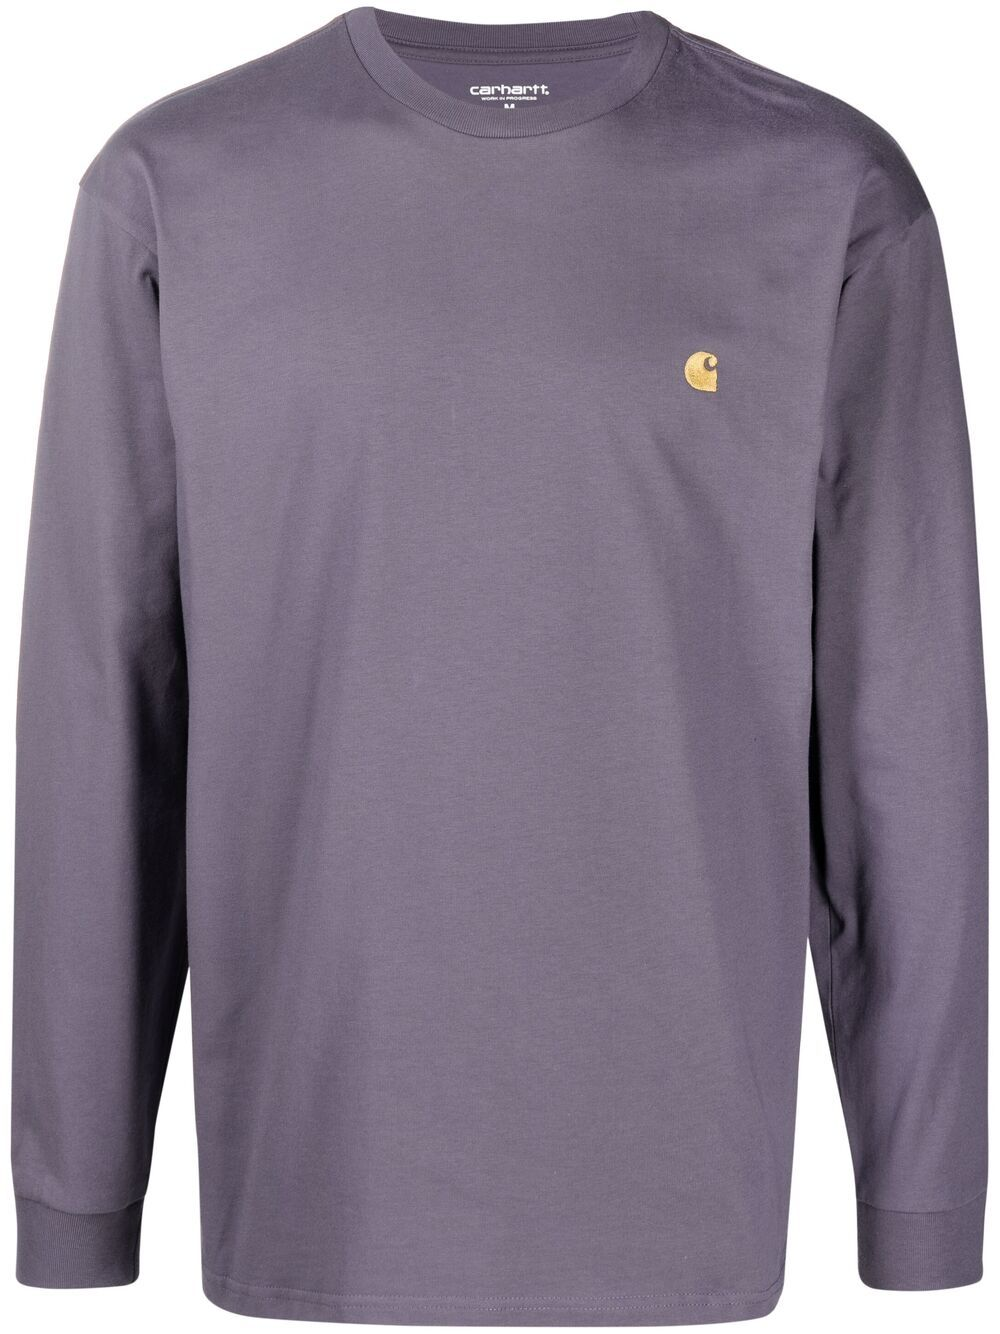 Carhartt l/s chase t-shirt unisex violet CARHARTT | T-shirts | I026392.030AF.90